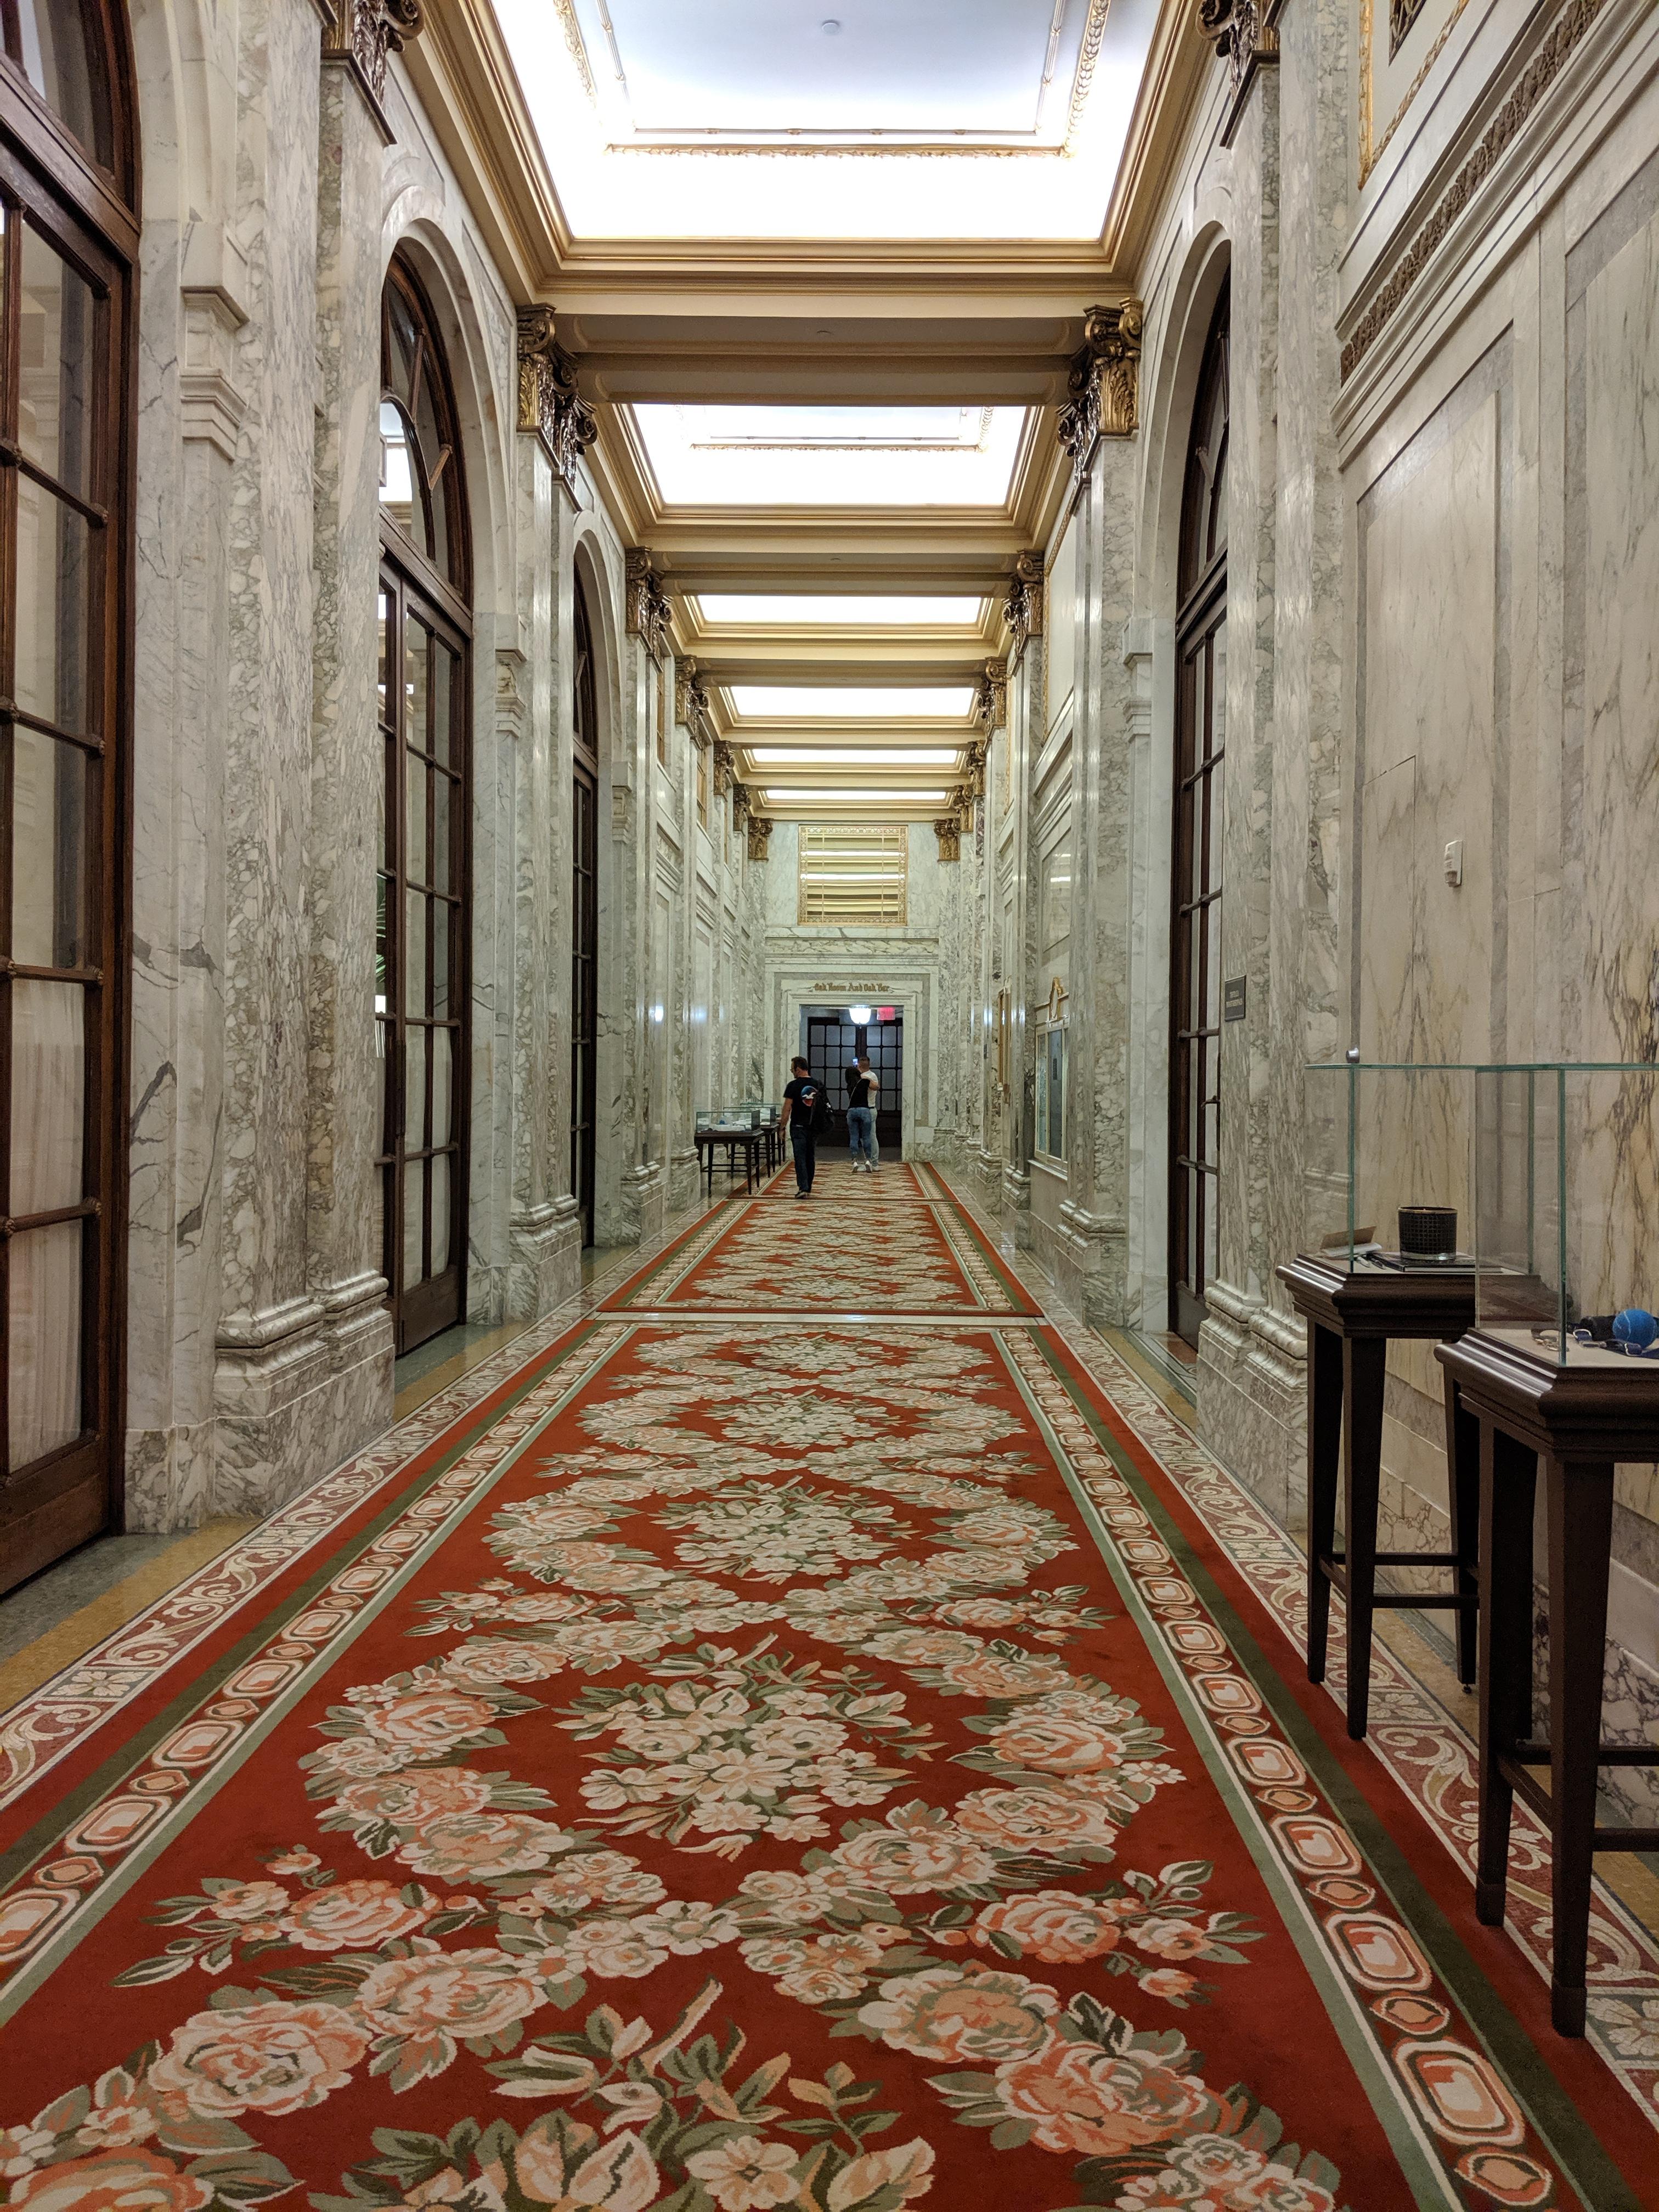 Inside the Plaza